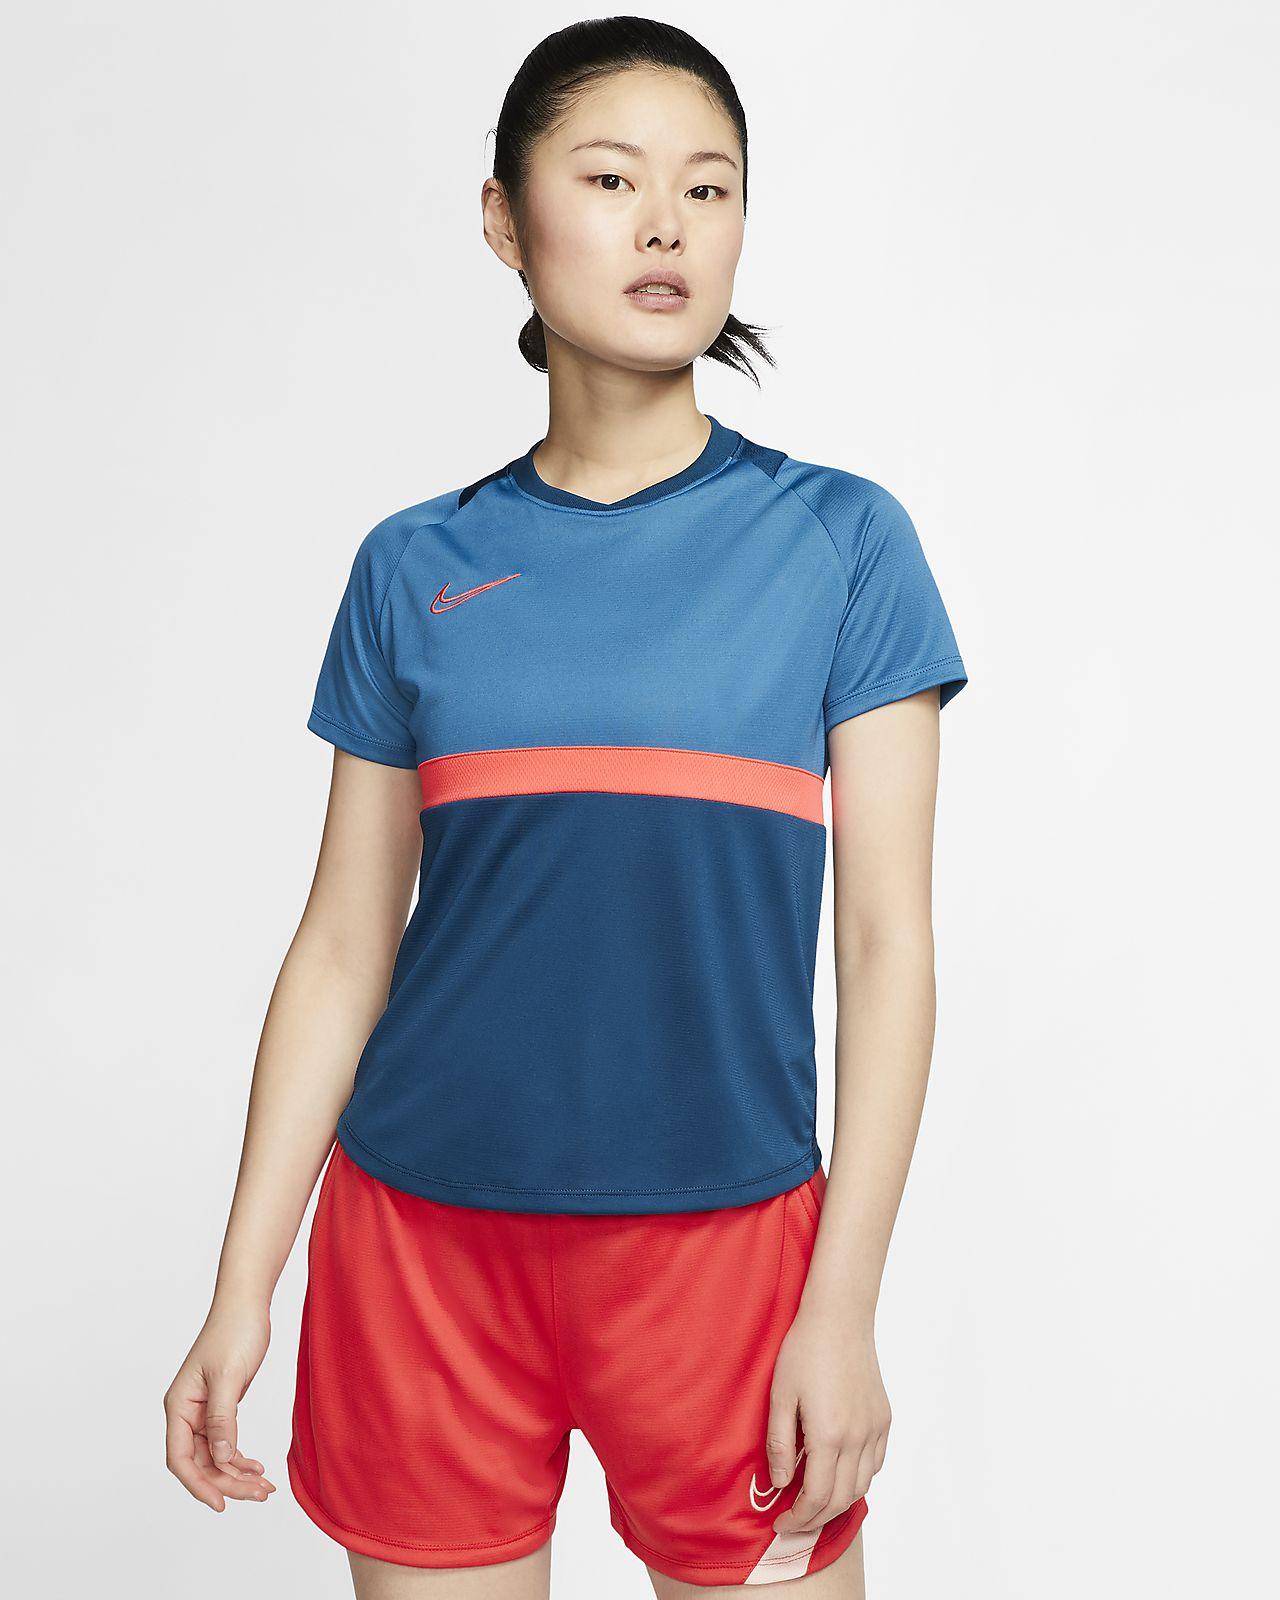 Nike Dri-FIT Academy Women's Short-Sleeve Soccer Top